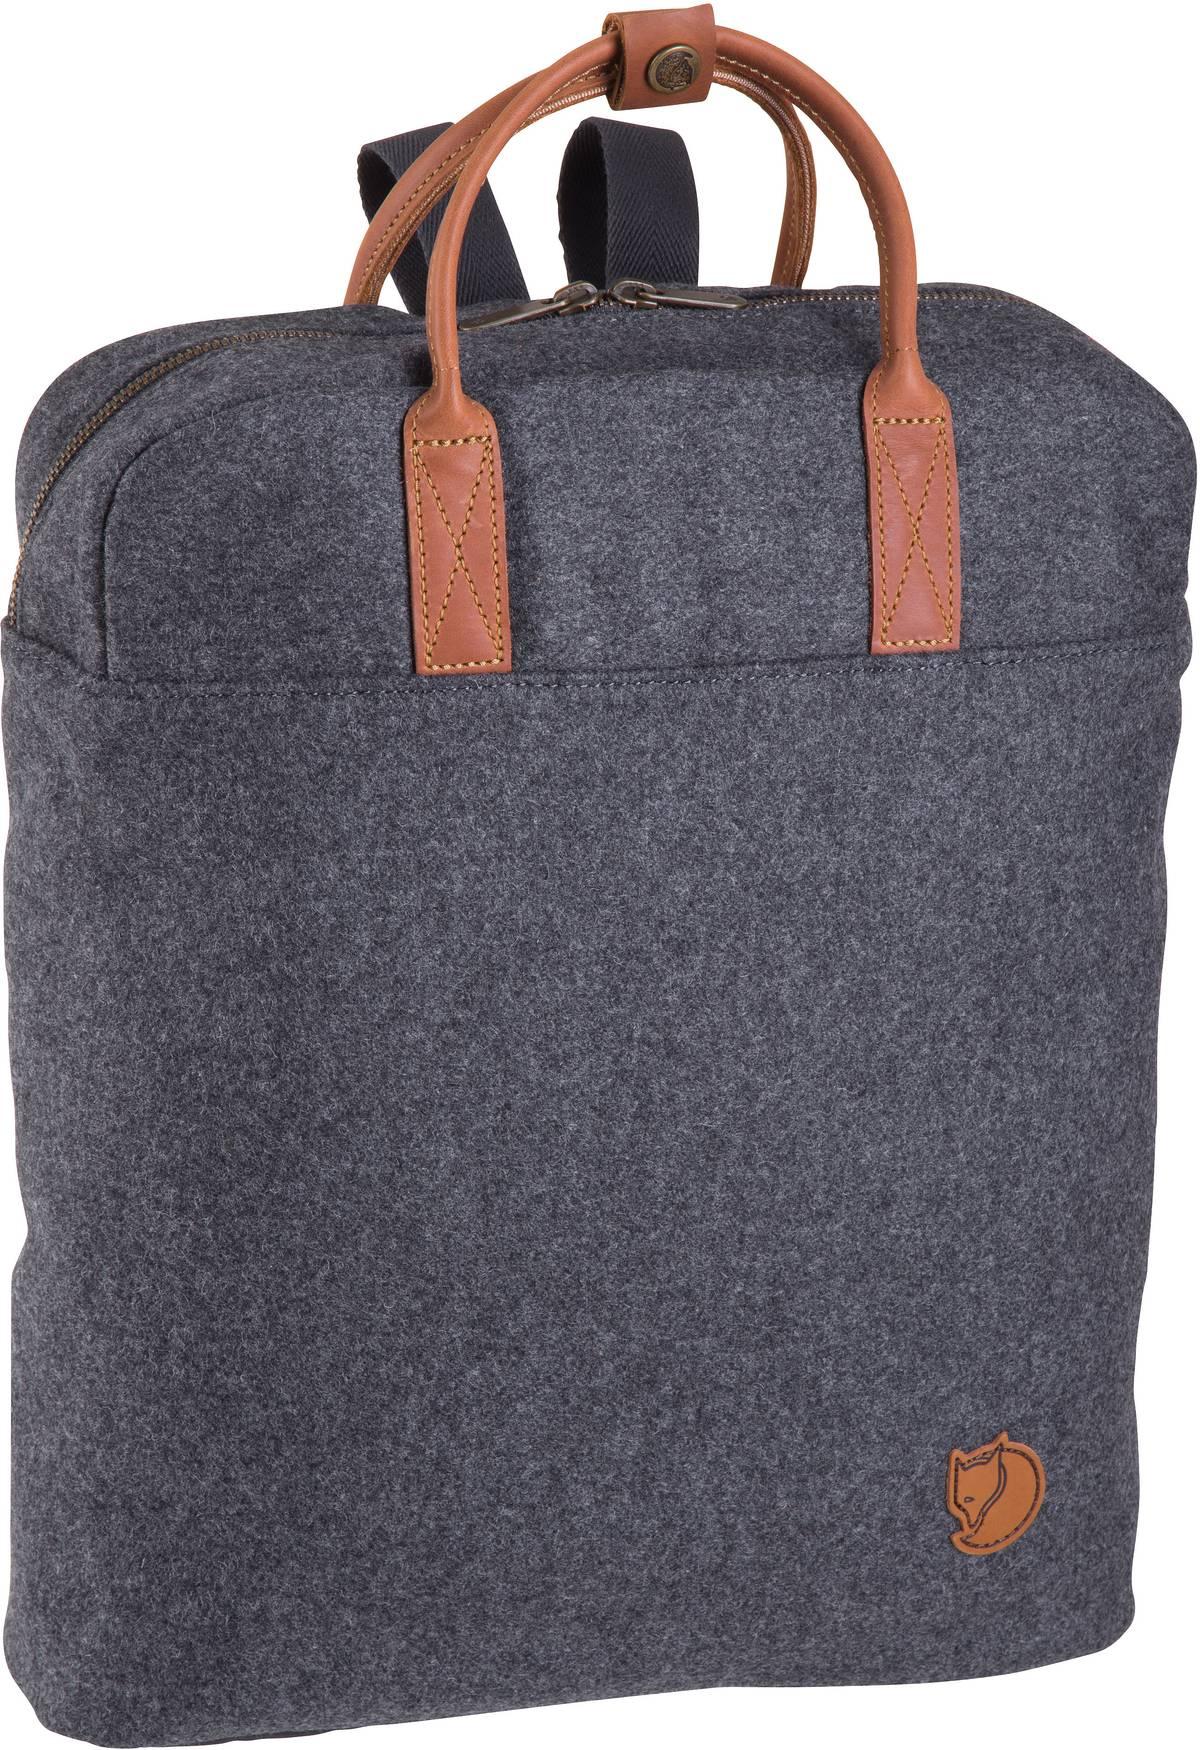 Rucksack / Daypack Norrvage Briefpack Grey (15 Liter)